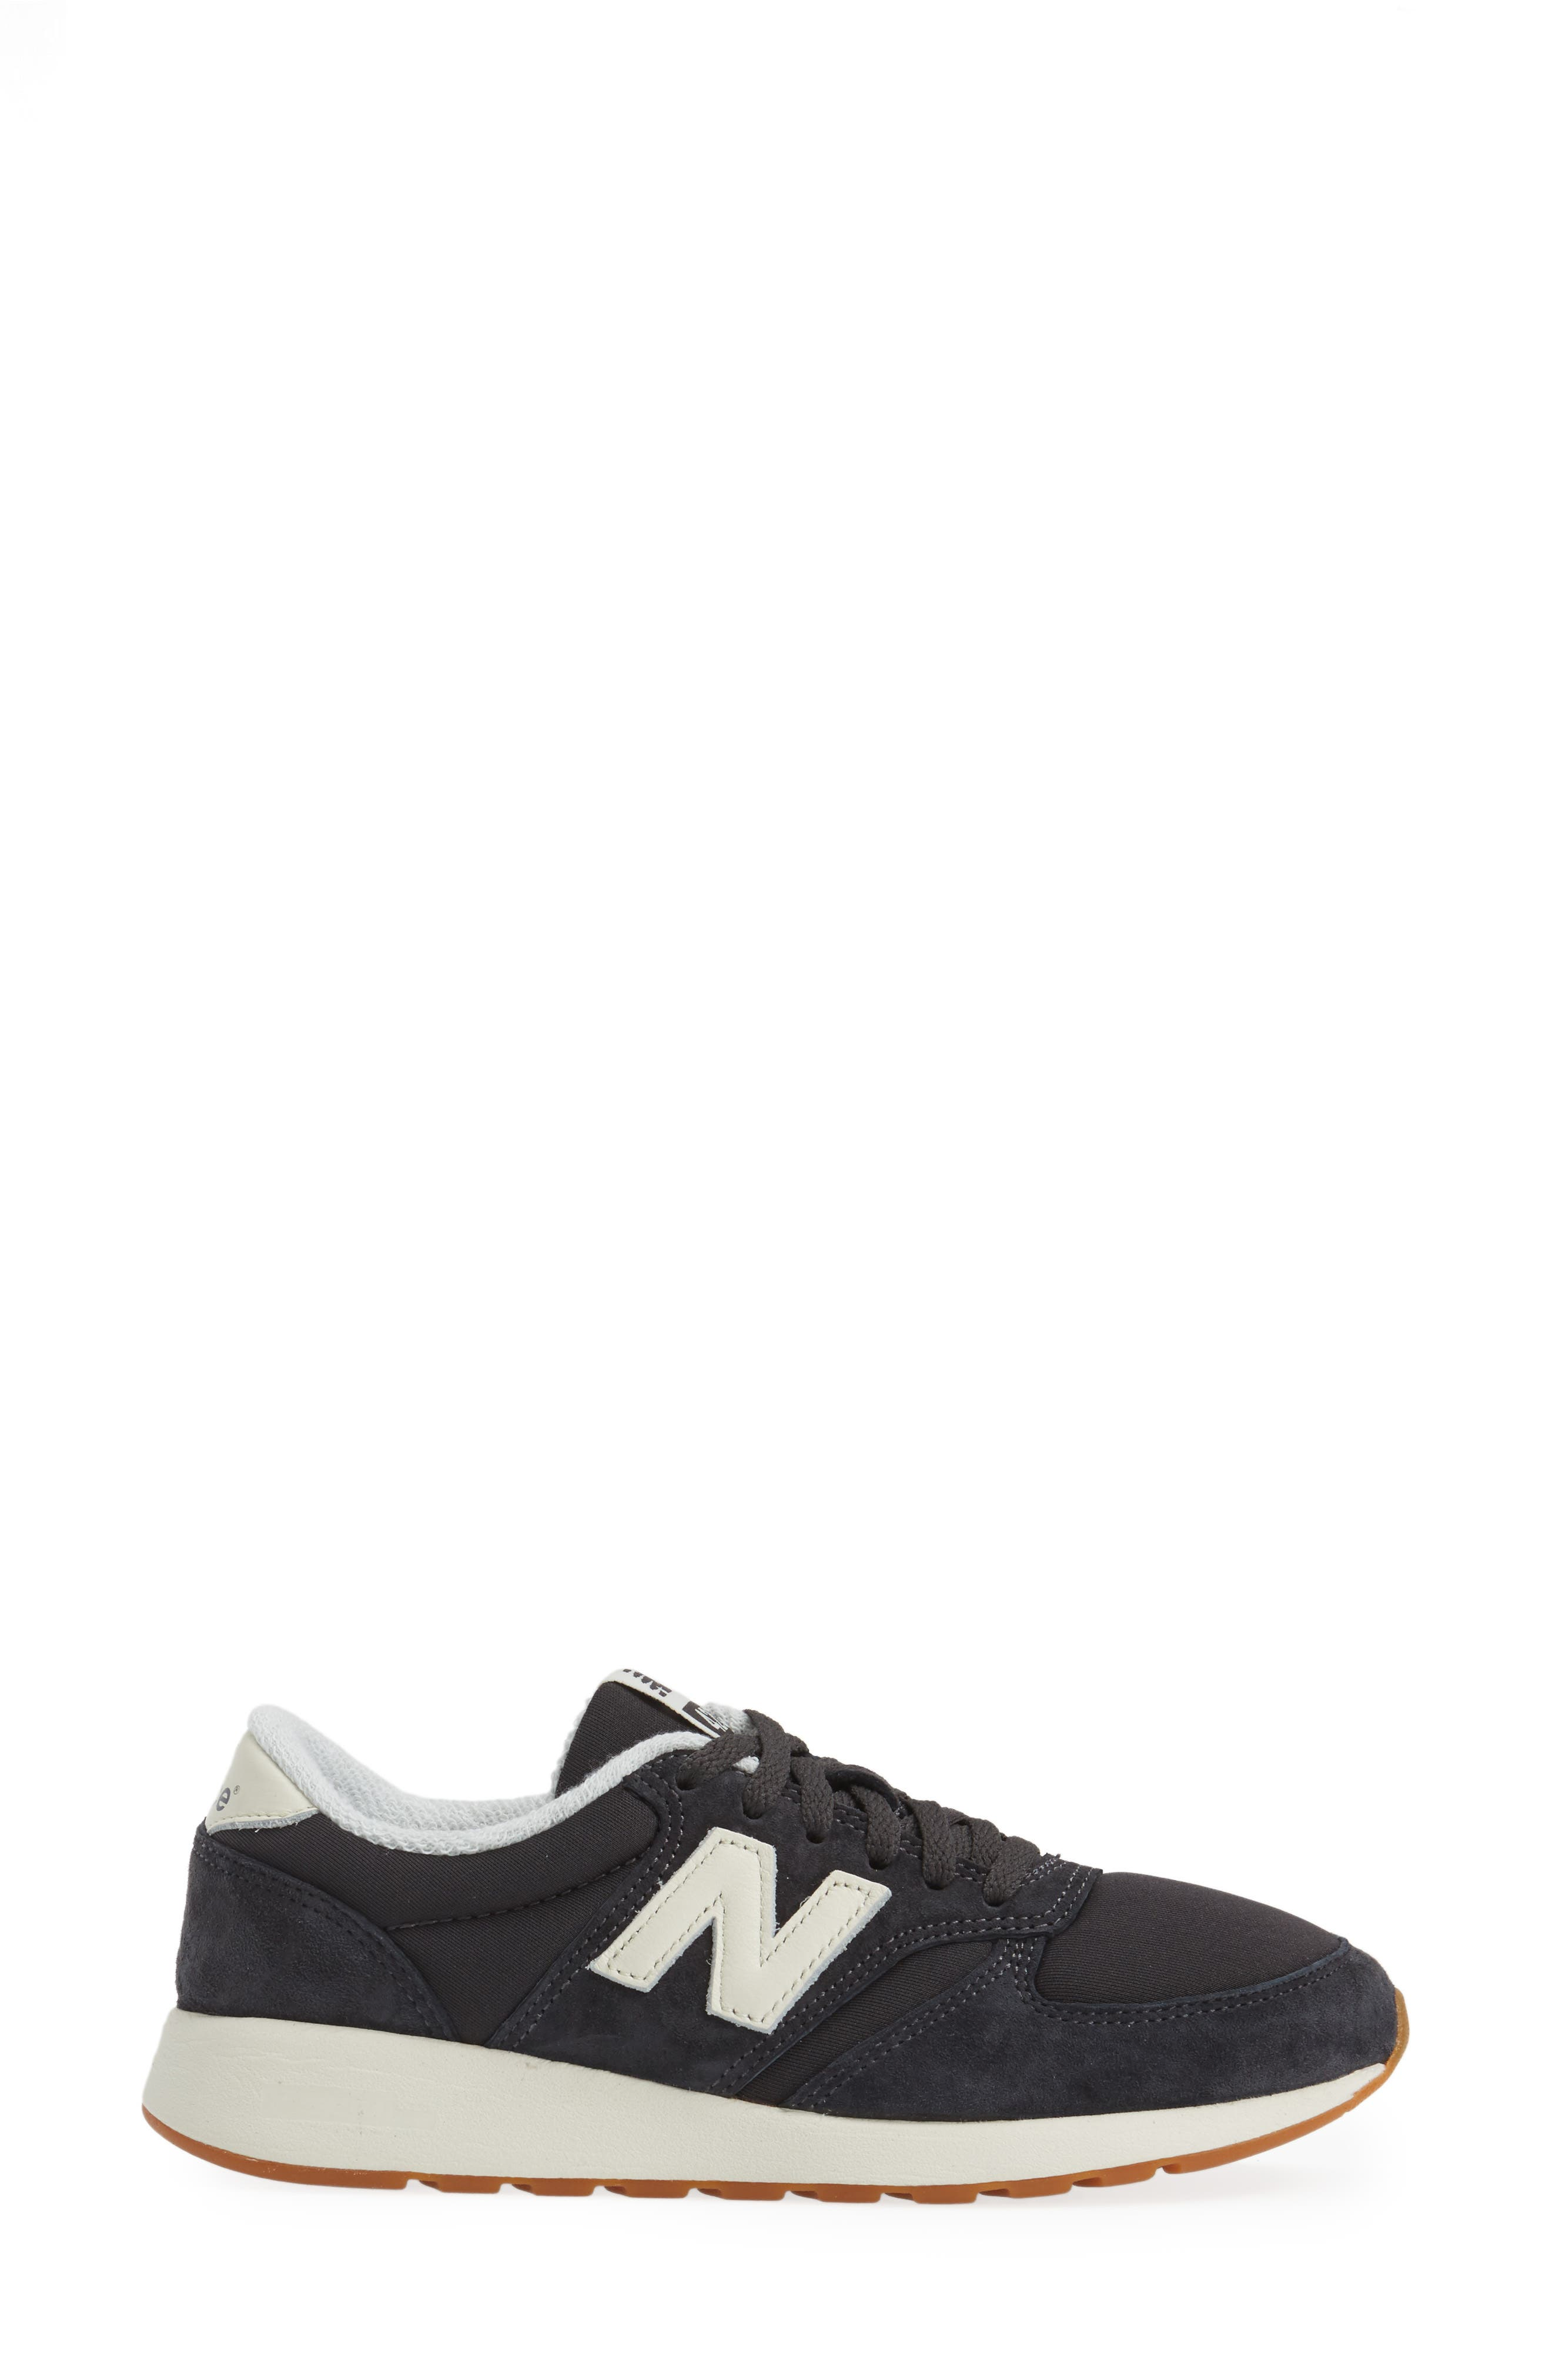 Alternate Image 3  - New Balance 420 Sneaker (Women)